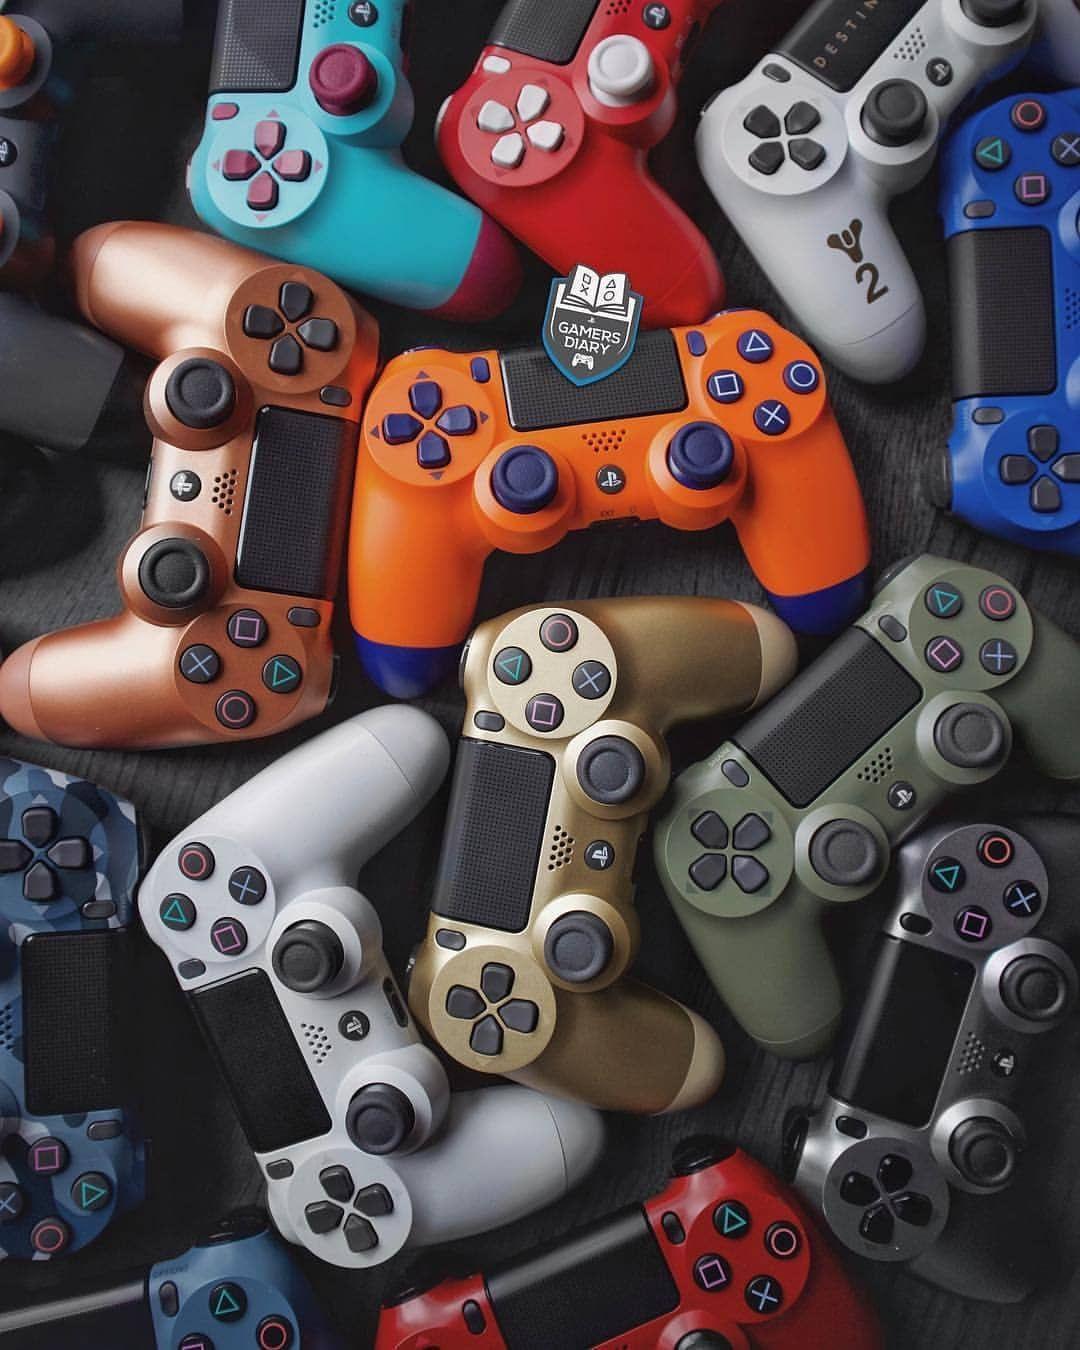 Pin de BROTHERTEDD em Video Games Jogos